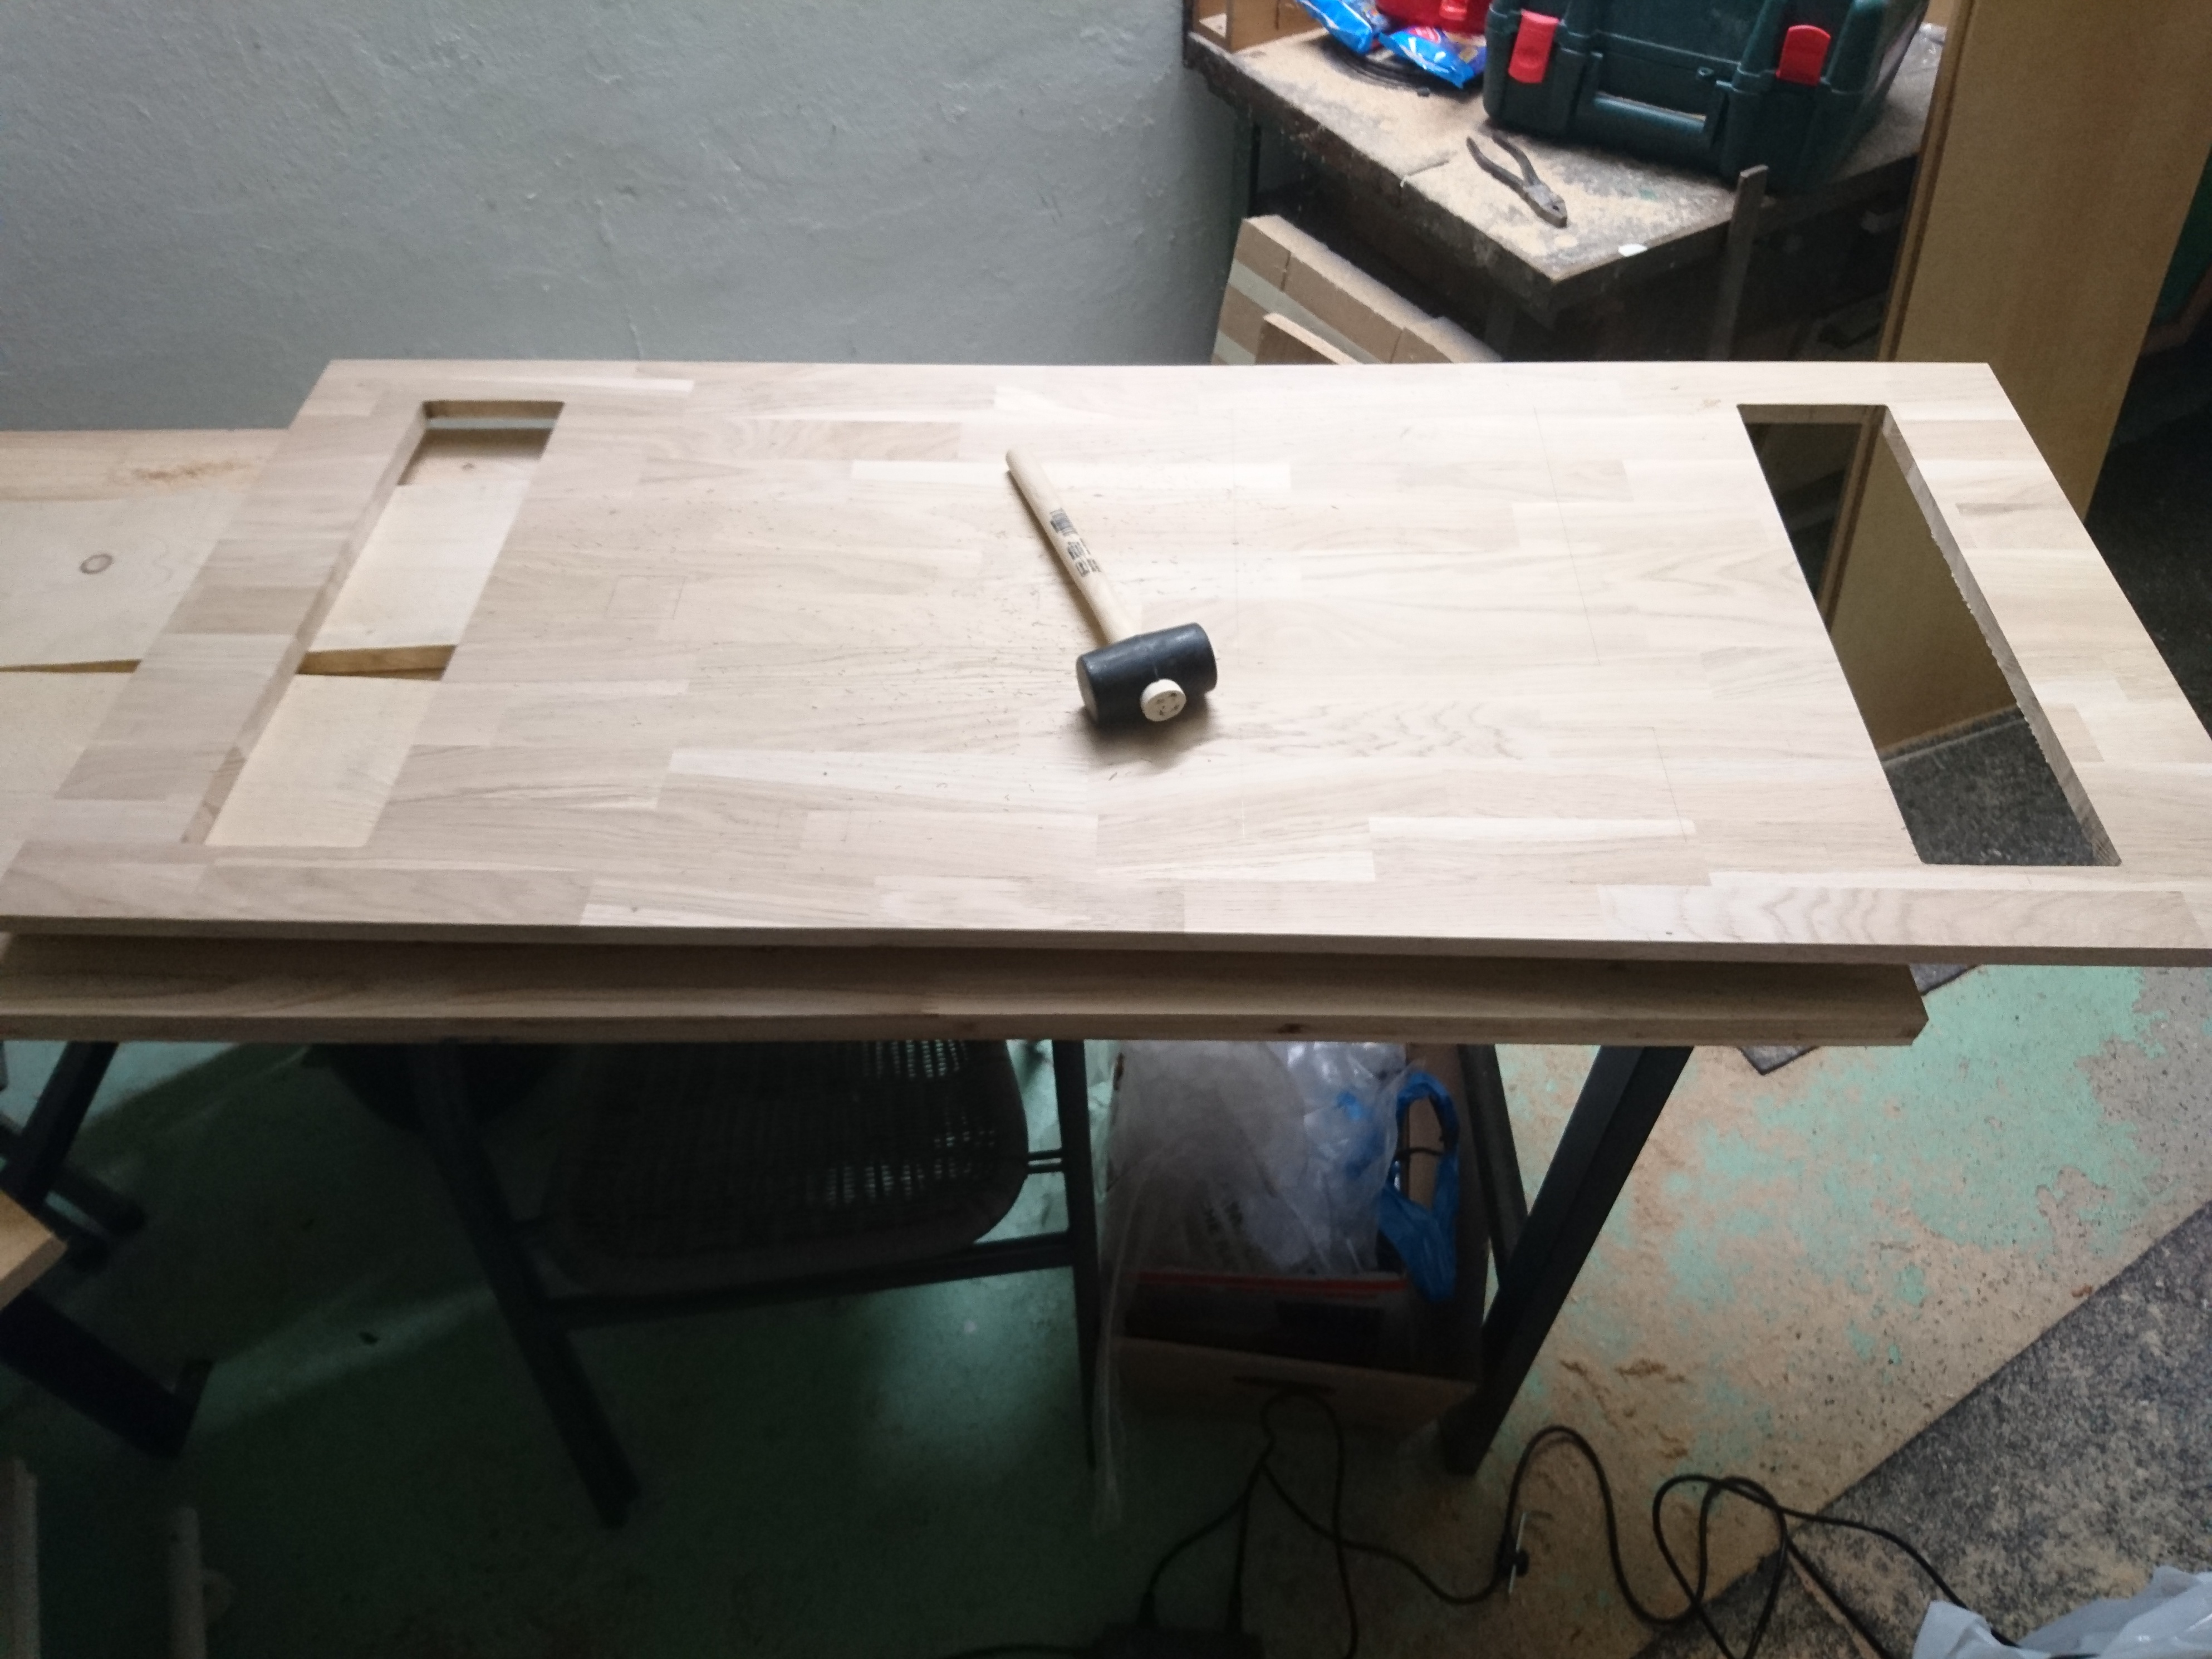 tisch bauen trendy full size of besten eckbank selber bauen anleitung tisch selber bauen. Black Bedroom Furniture Sets. Home Design Ideas